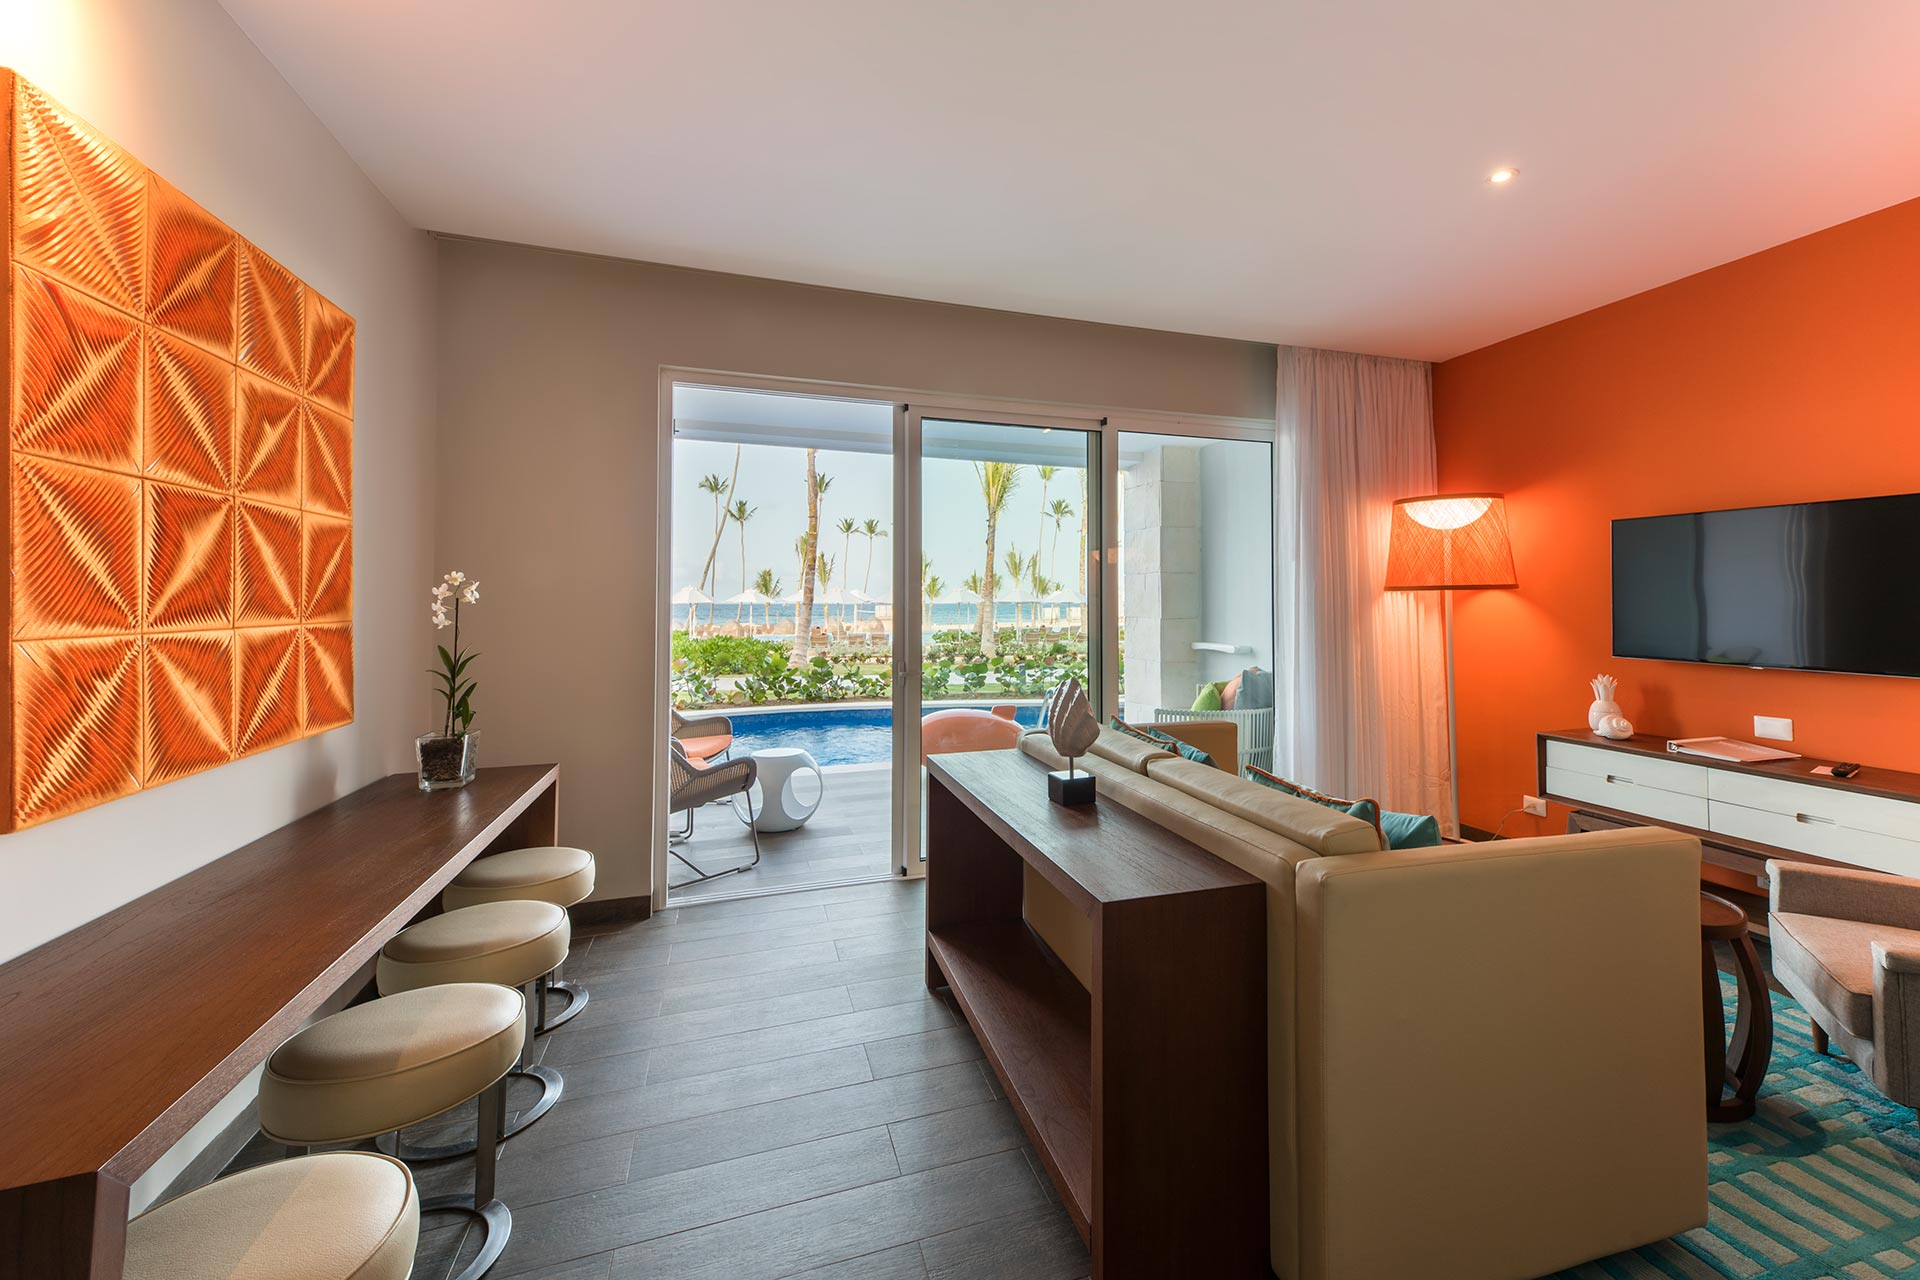 Swim-Up Suite at Nickelodeon Hotels and Resorts Punta Cana